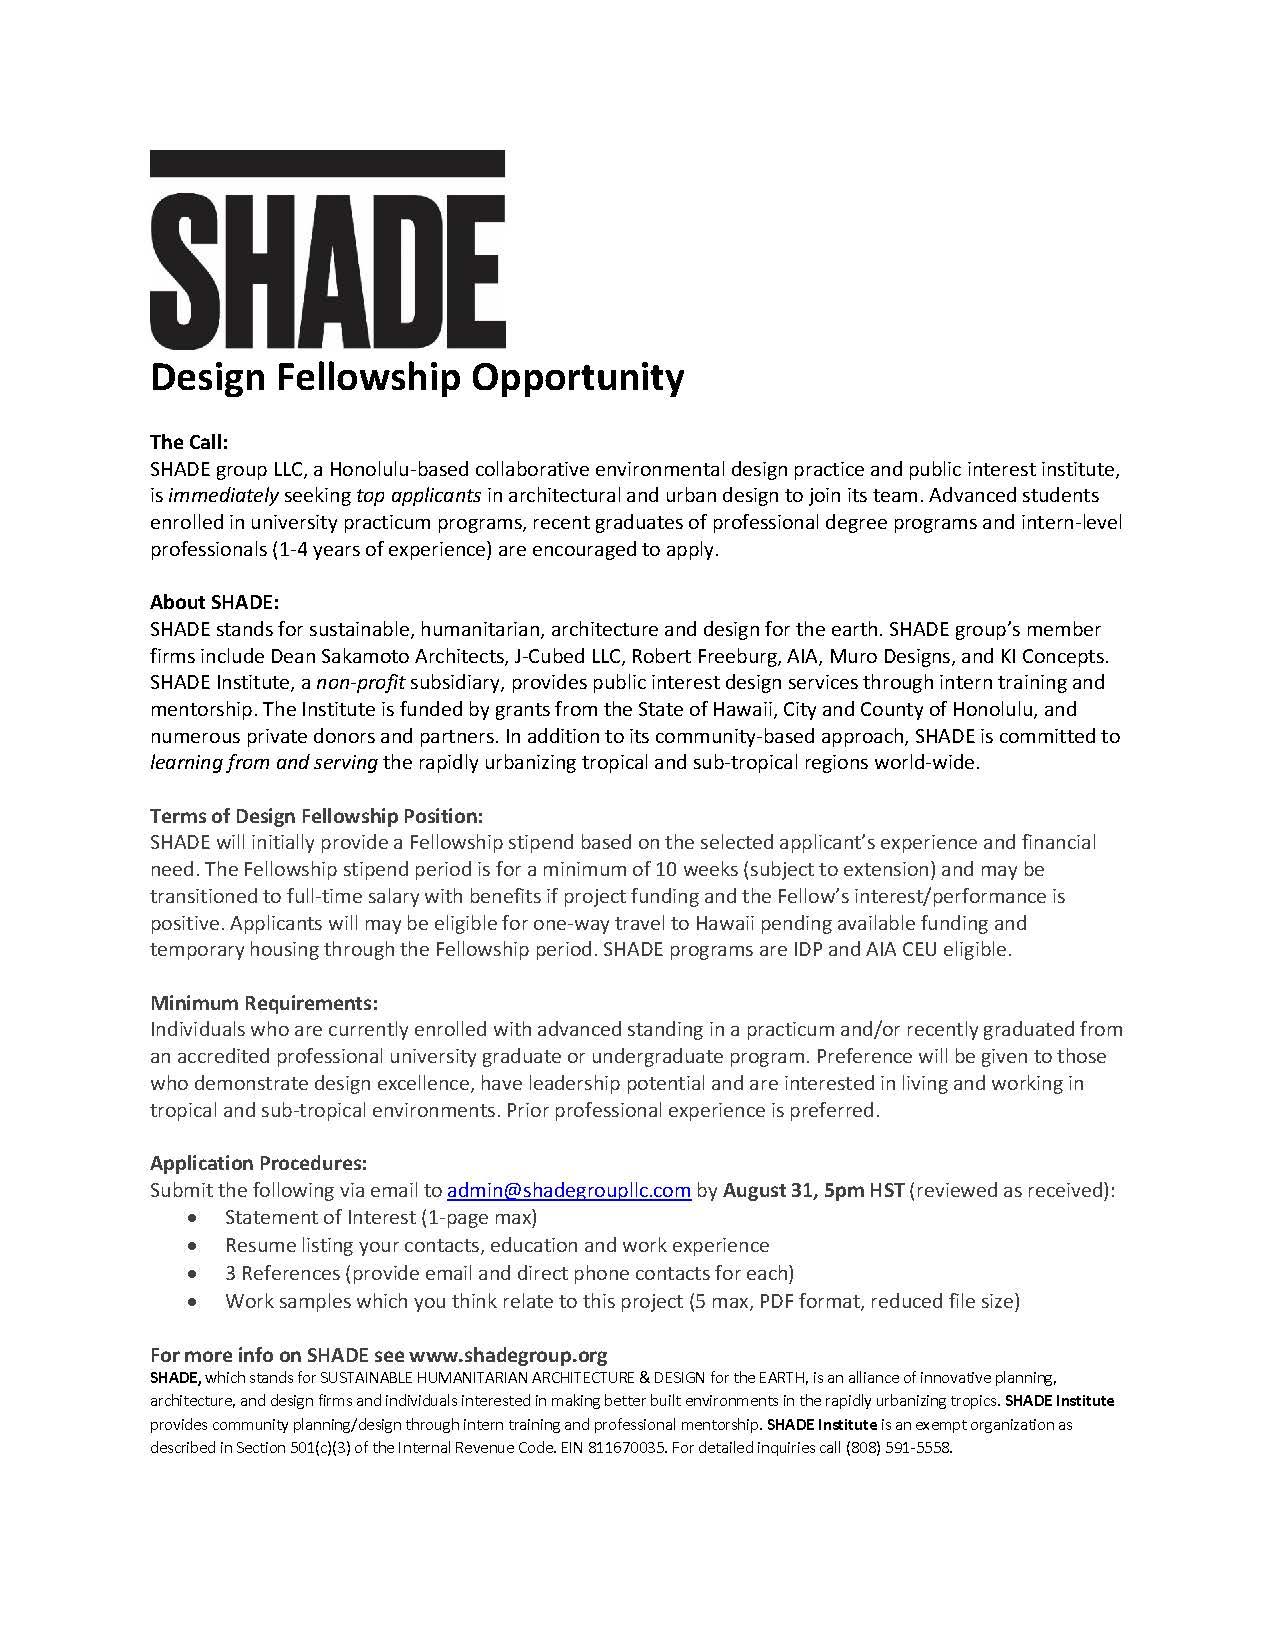 SHADE-SHADE Design Fellowship Opportunity